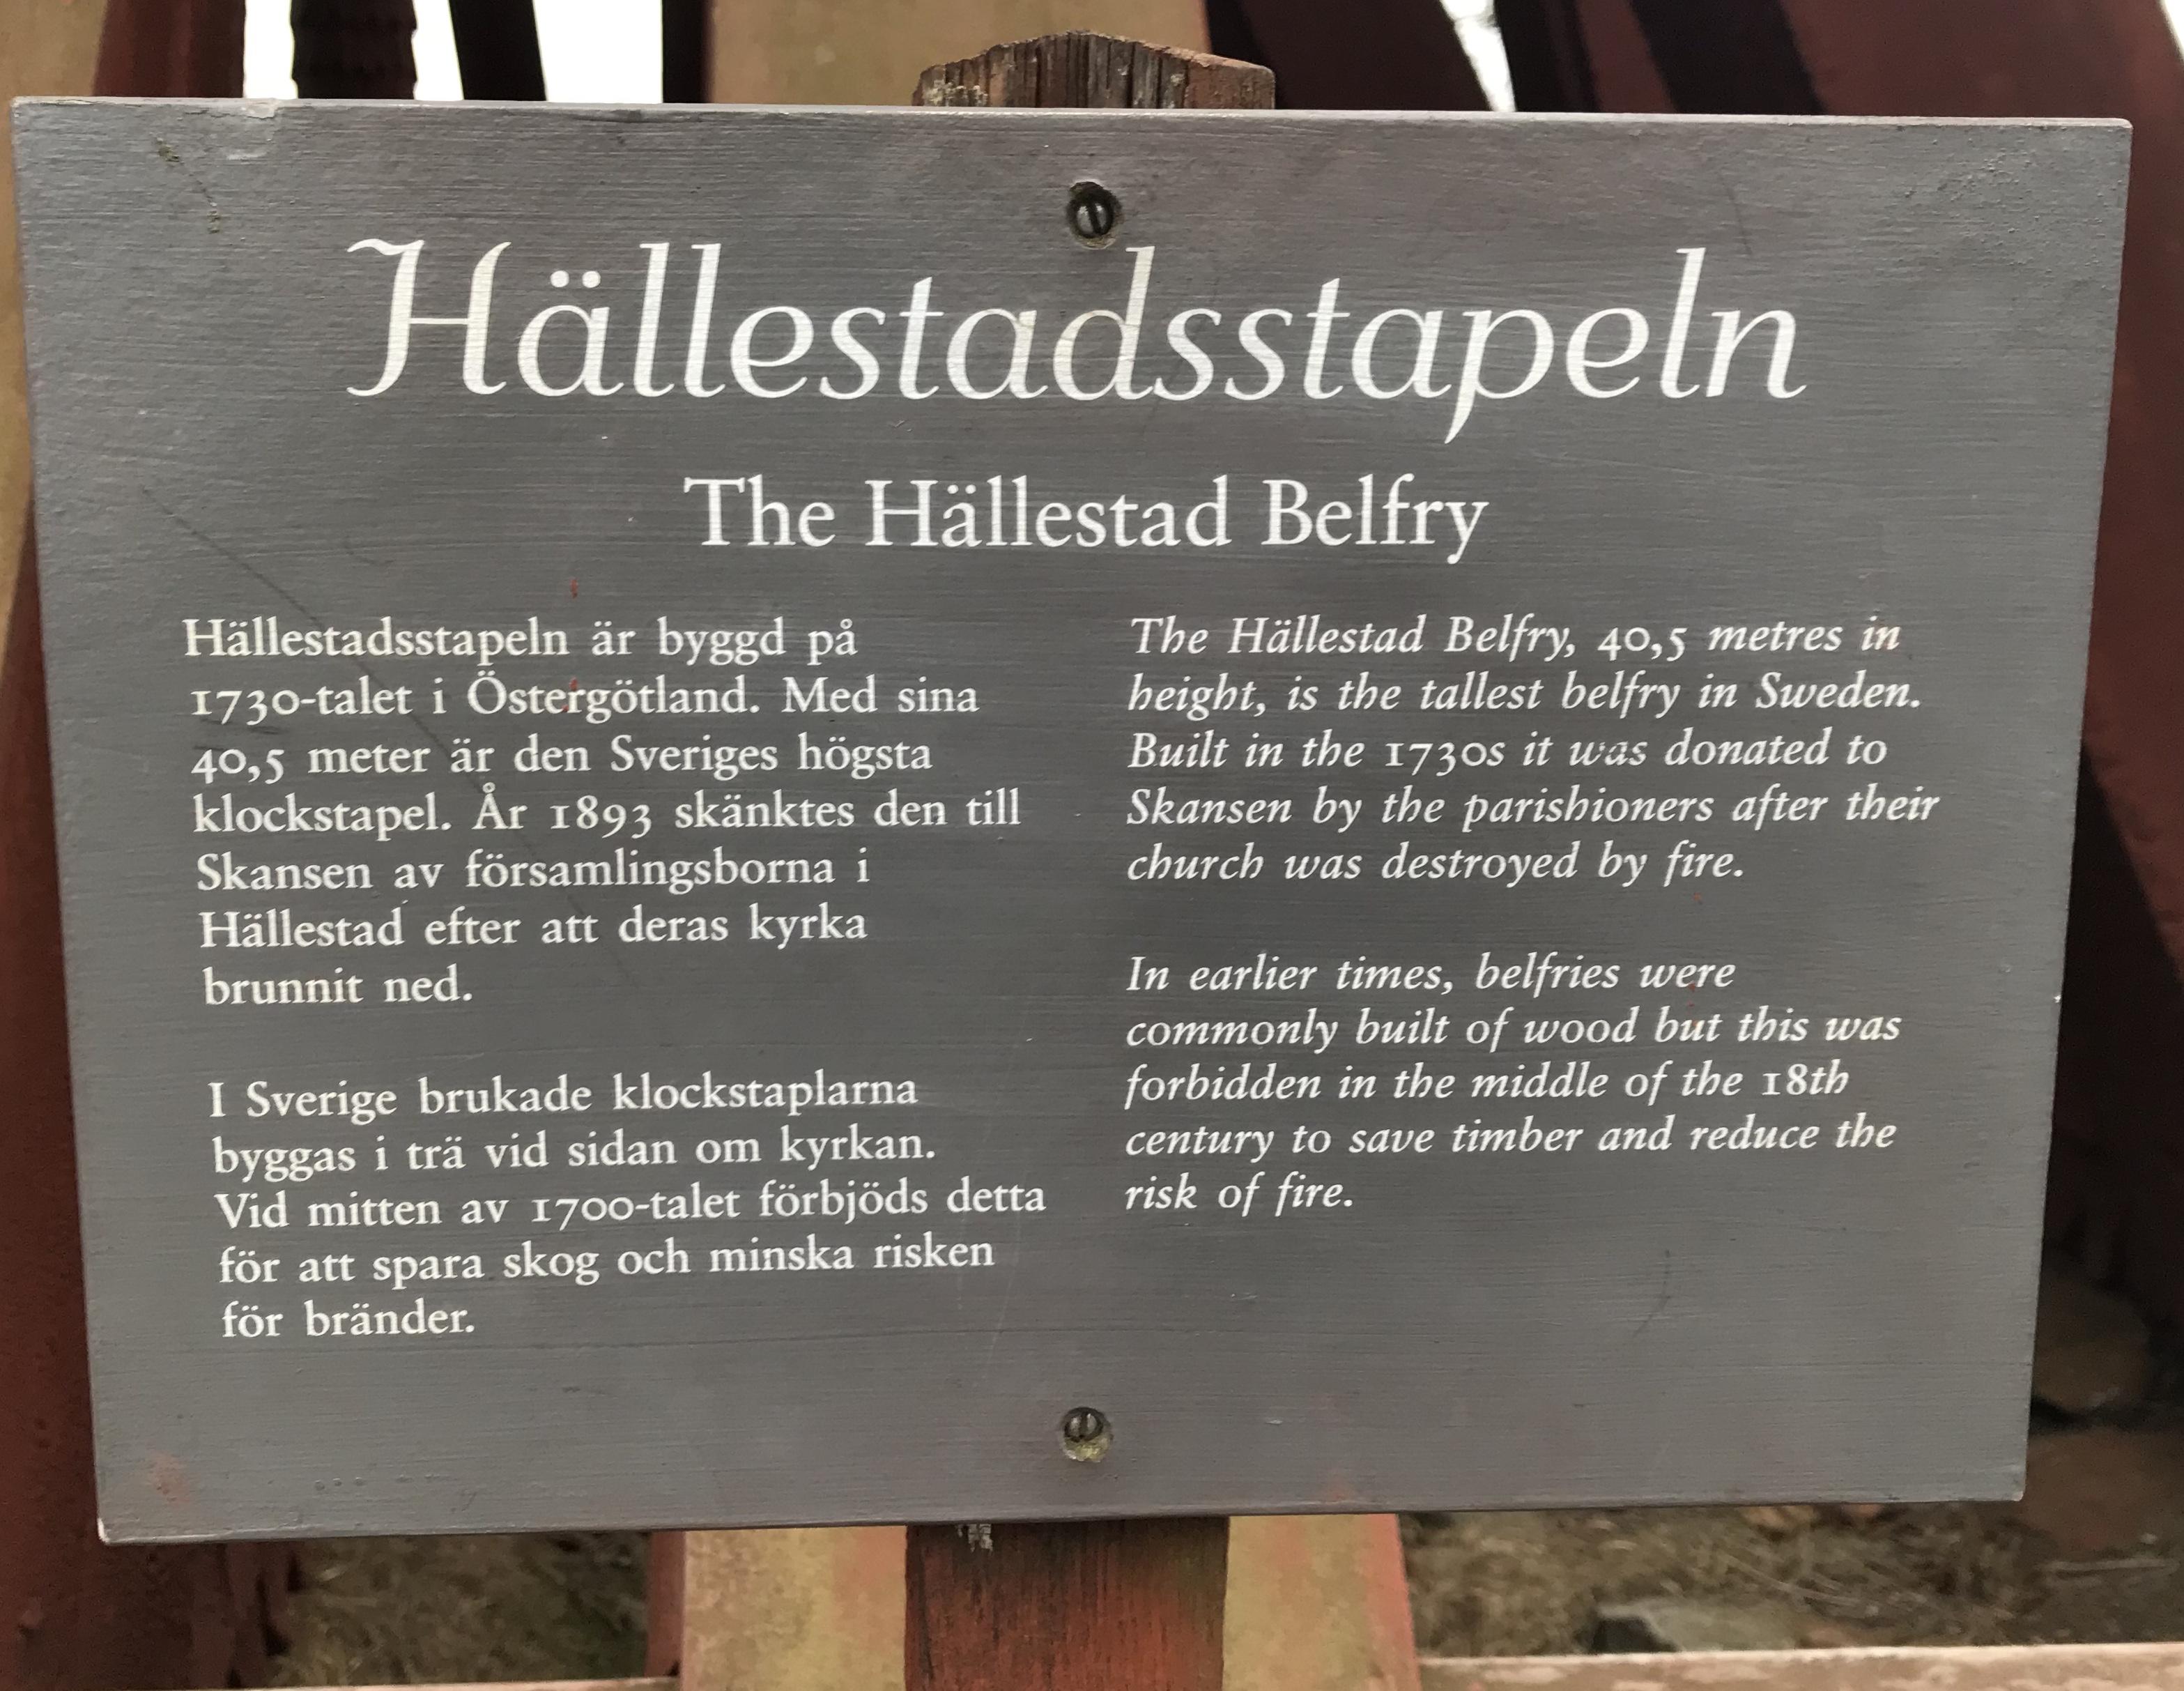 Kalidou Koulibaly Fru Sexuell Dysfunktion - Dating Sites I Hällestad